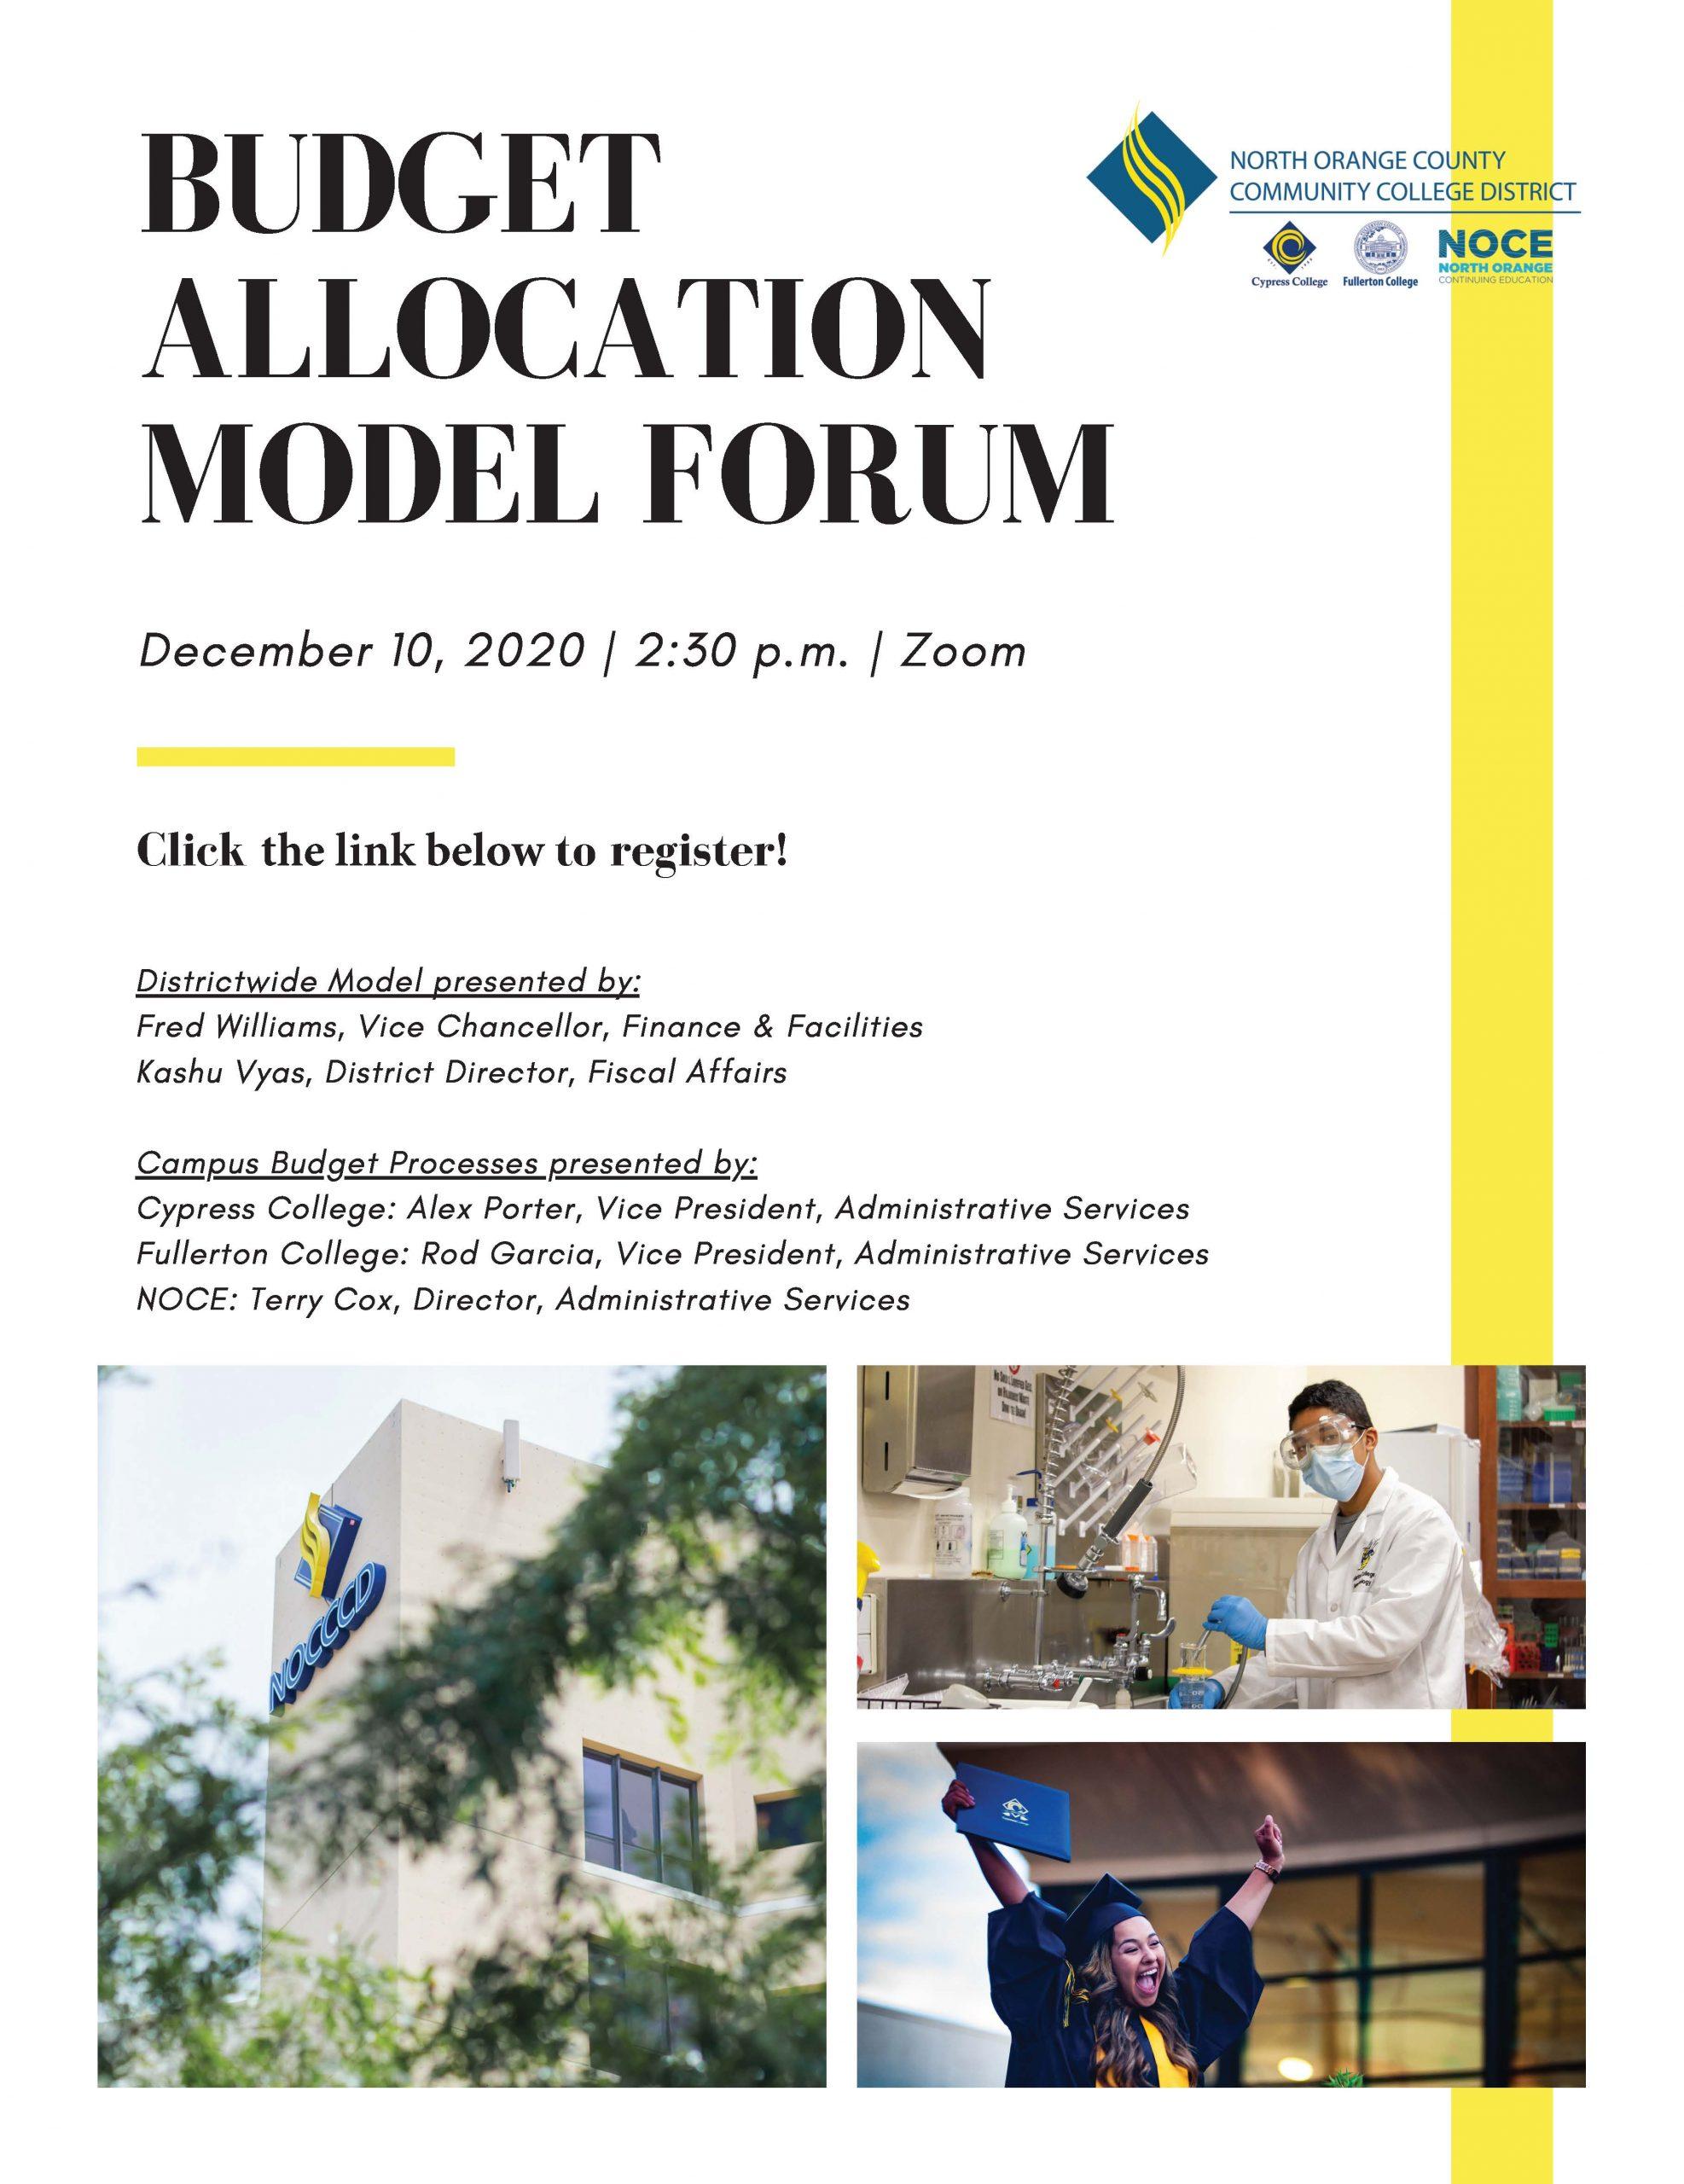 Budget Allocation Model Forum flyer